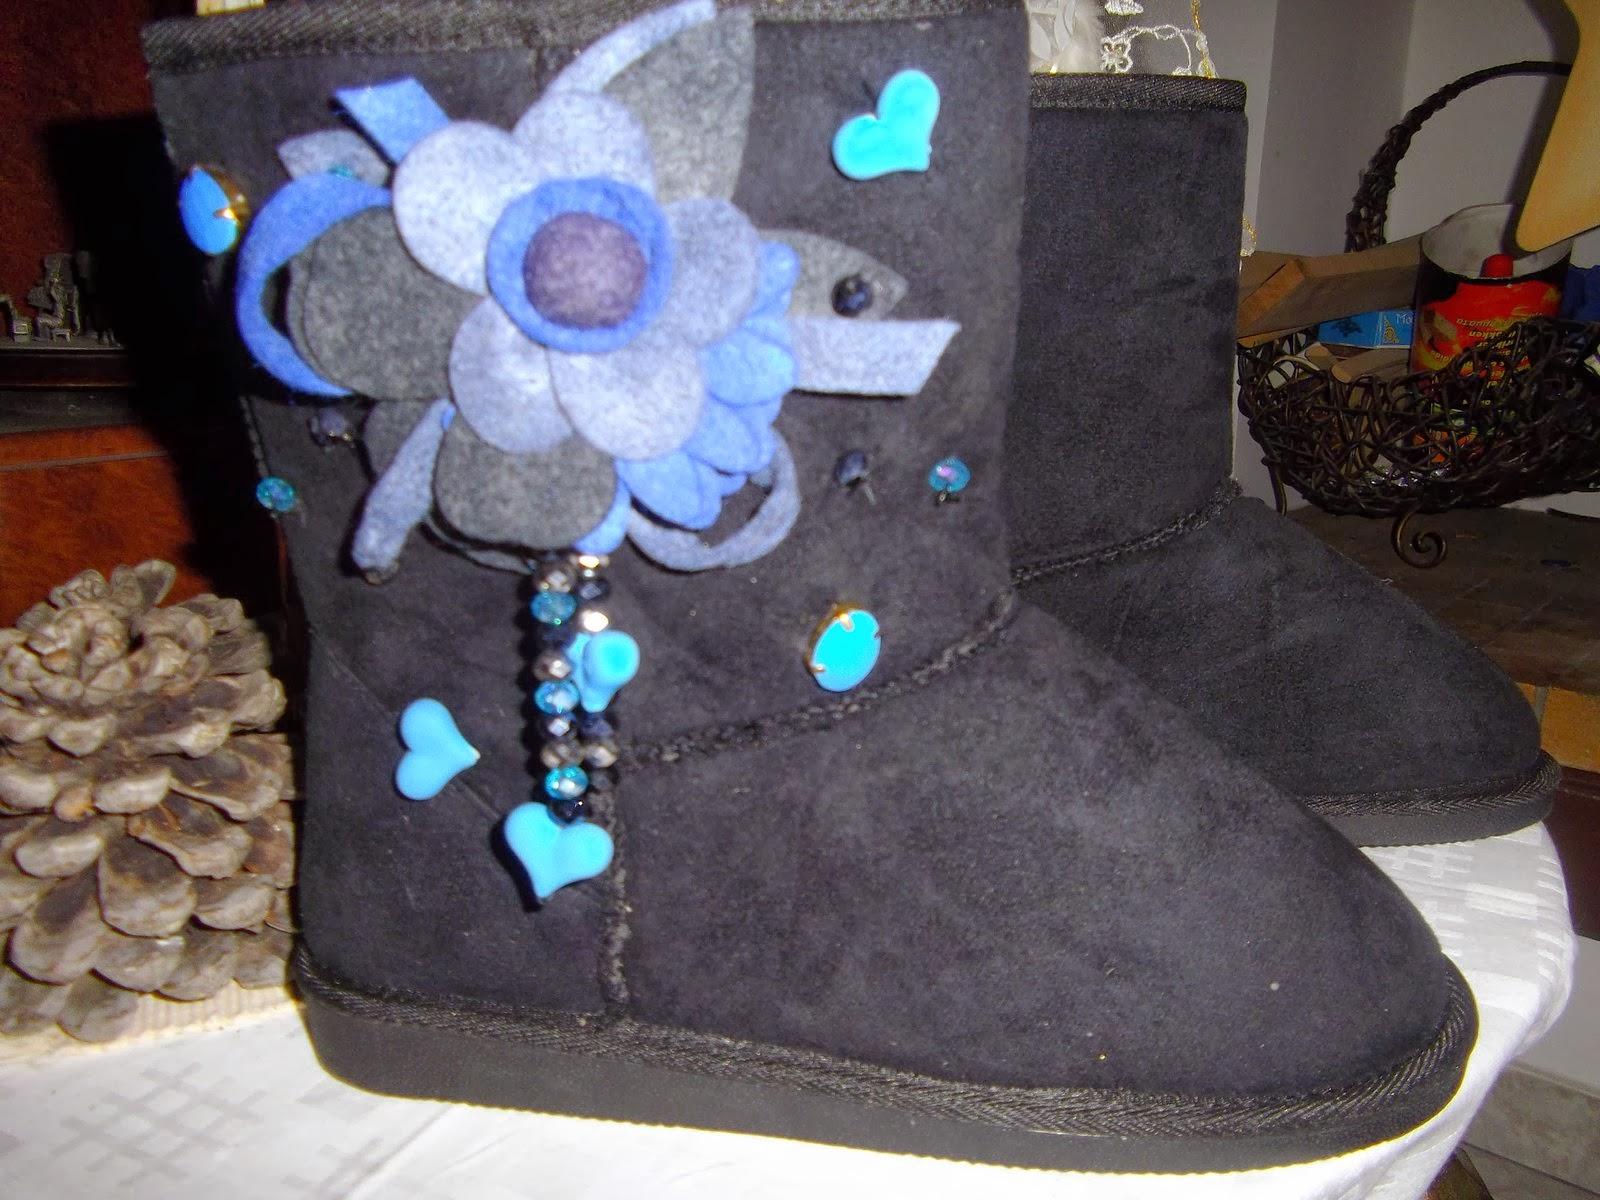 74937fc6462 Amanda's Handmade Creations: Γυναικείες μπότες τύπου Ugg ...